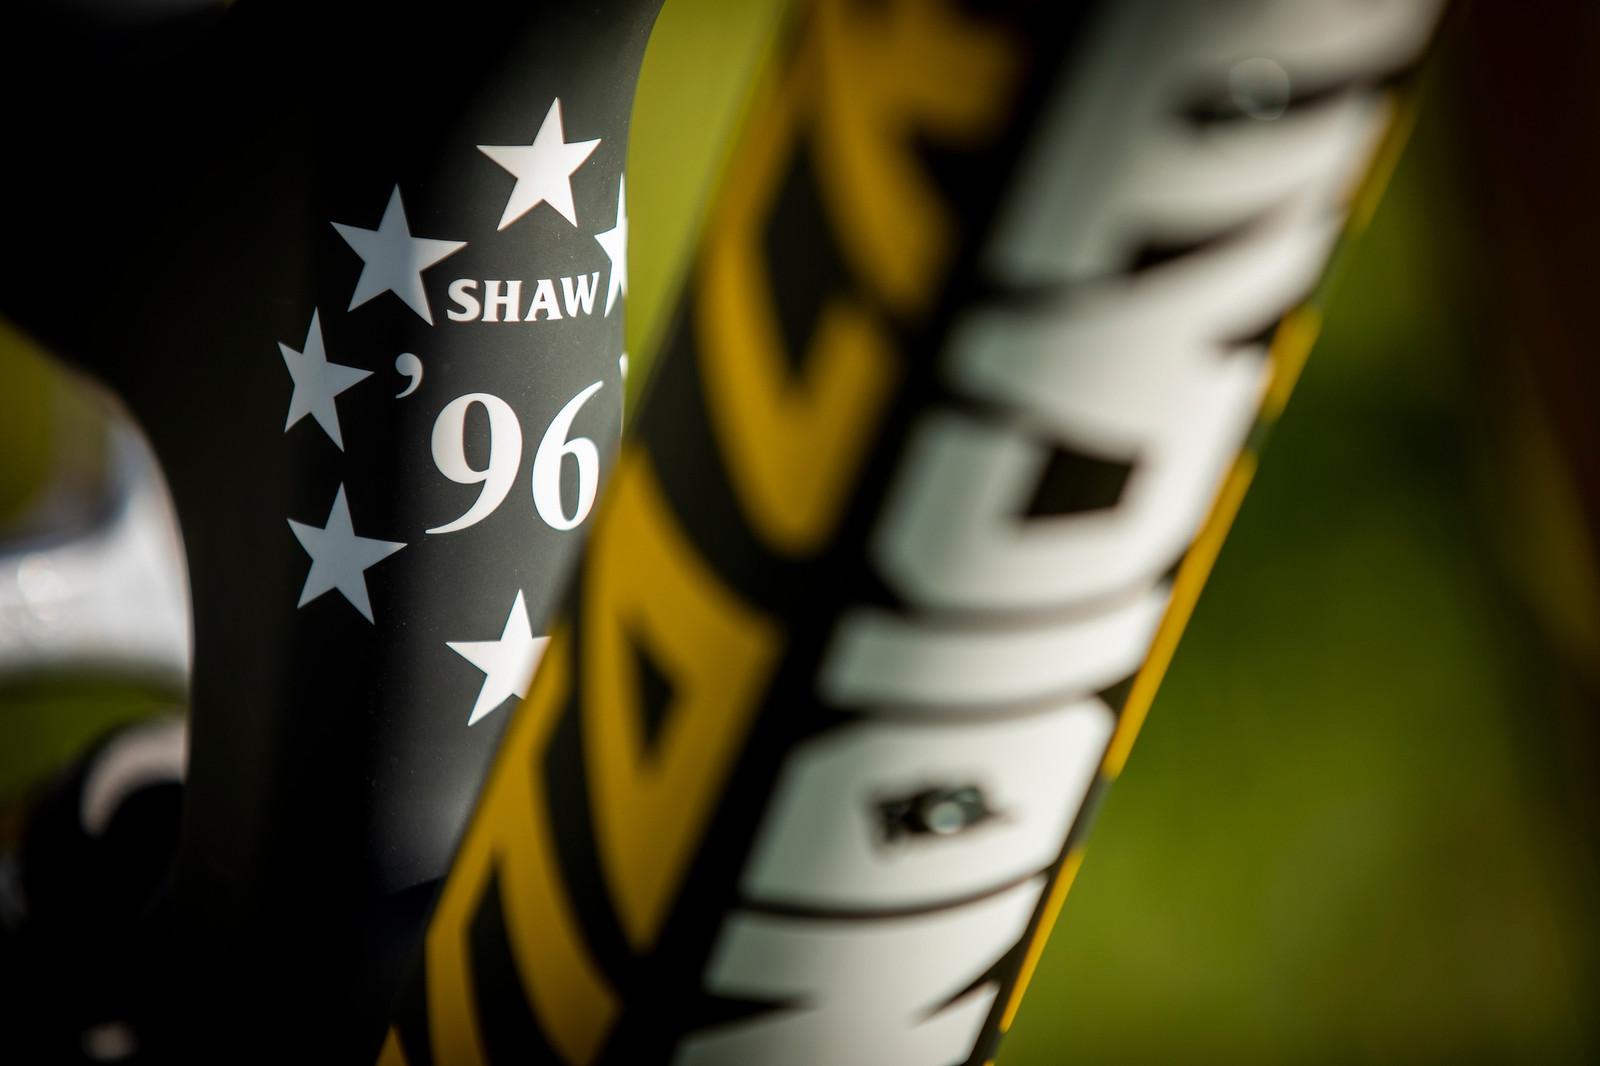 Heritage - WORLD CHAMPS BIKE - Luca Shaw's Santa Cruz V10 - Mountain Biking Pictures - Vital MTB